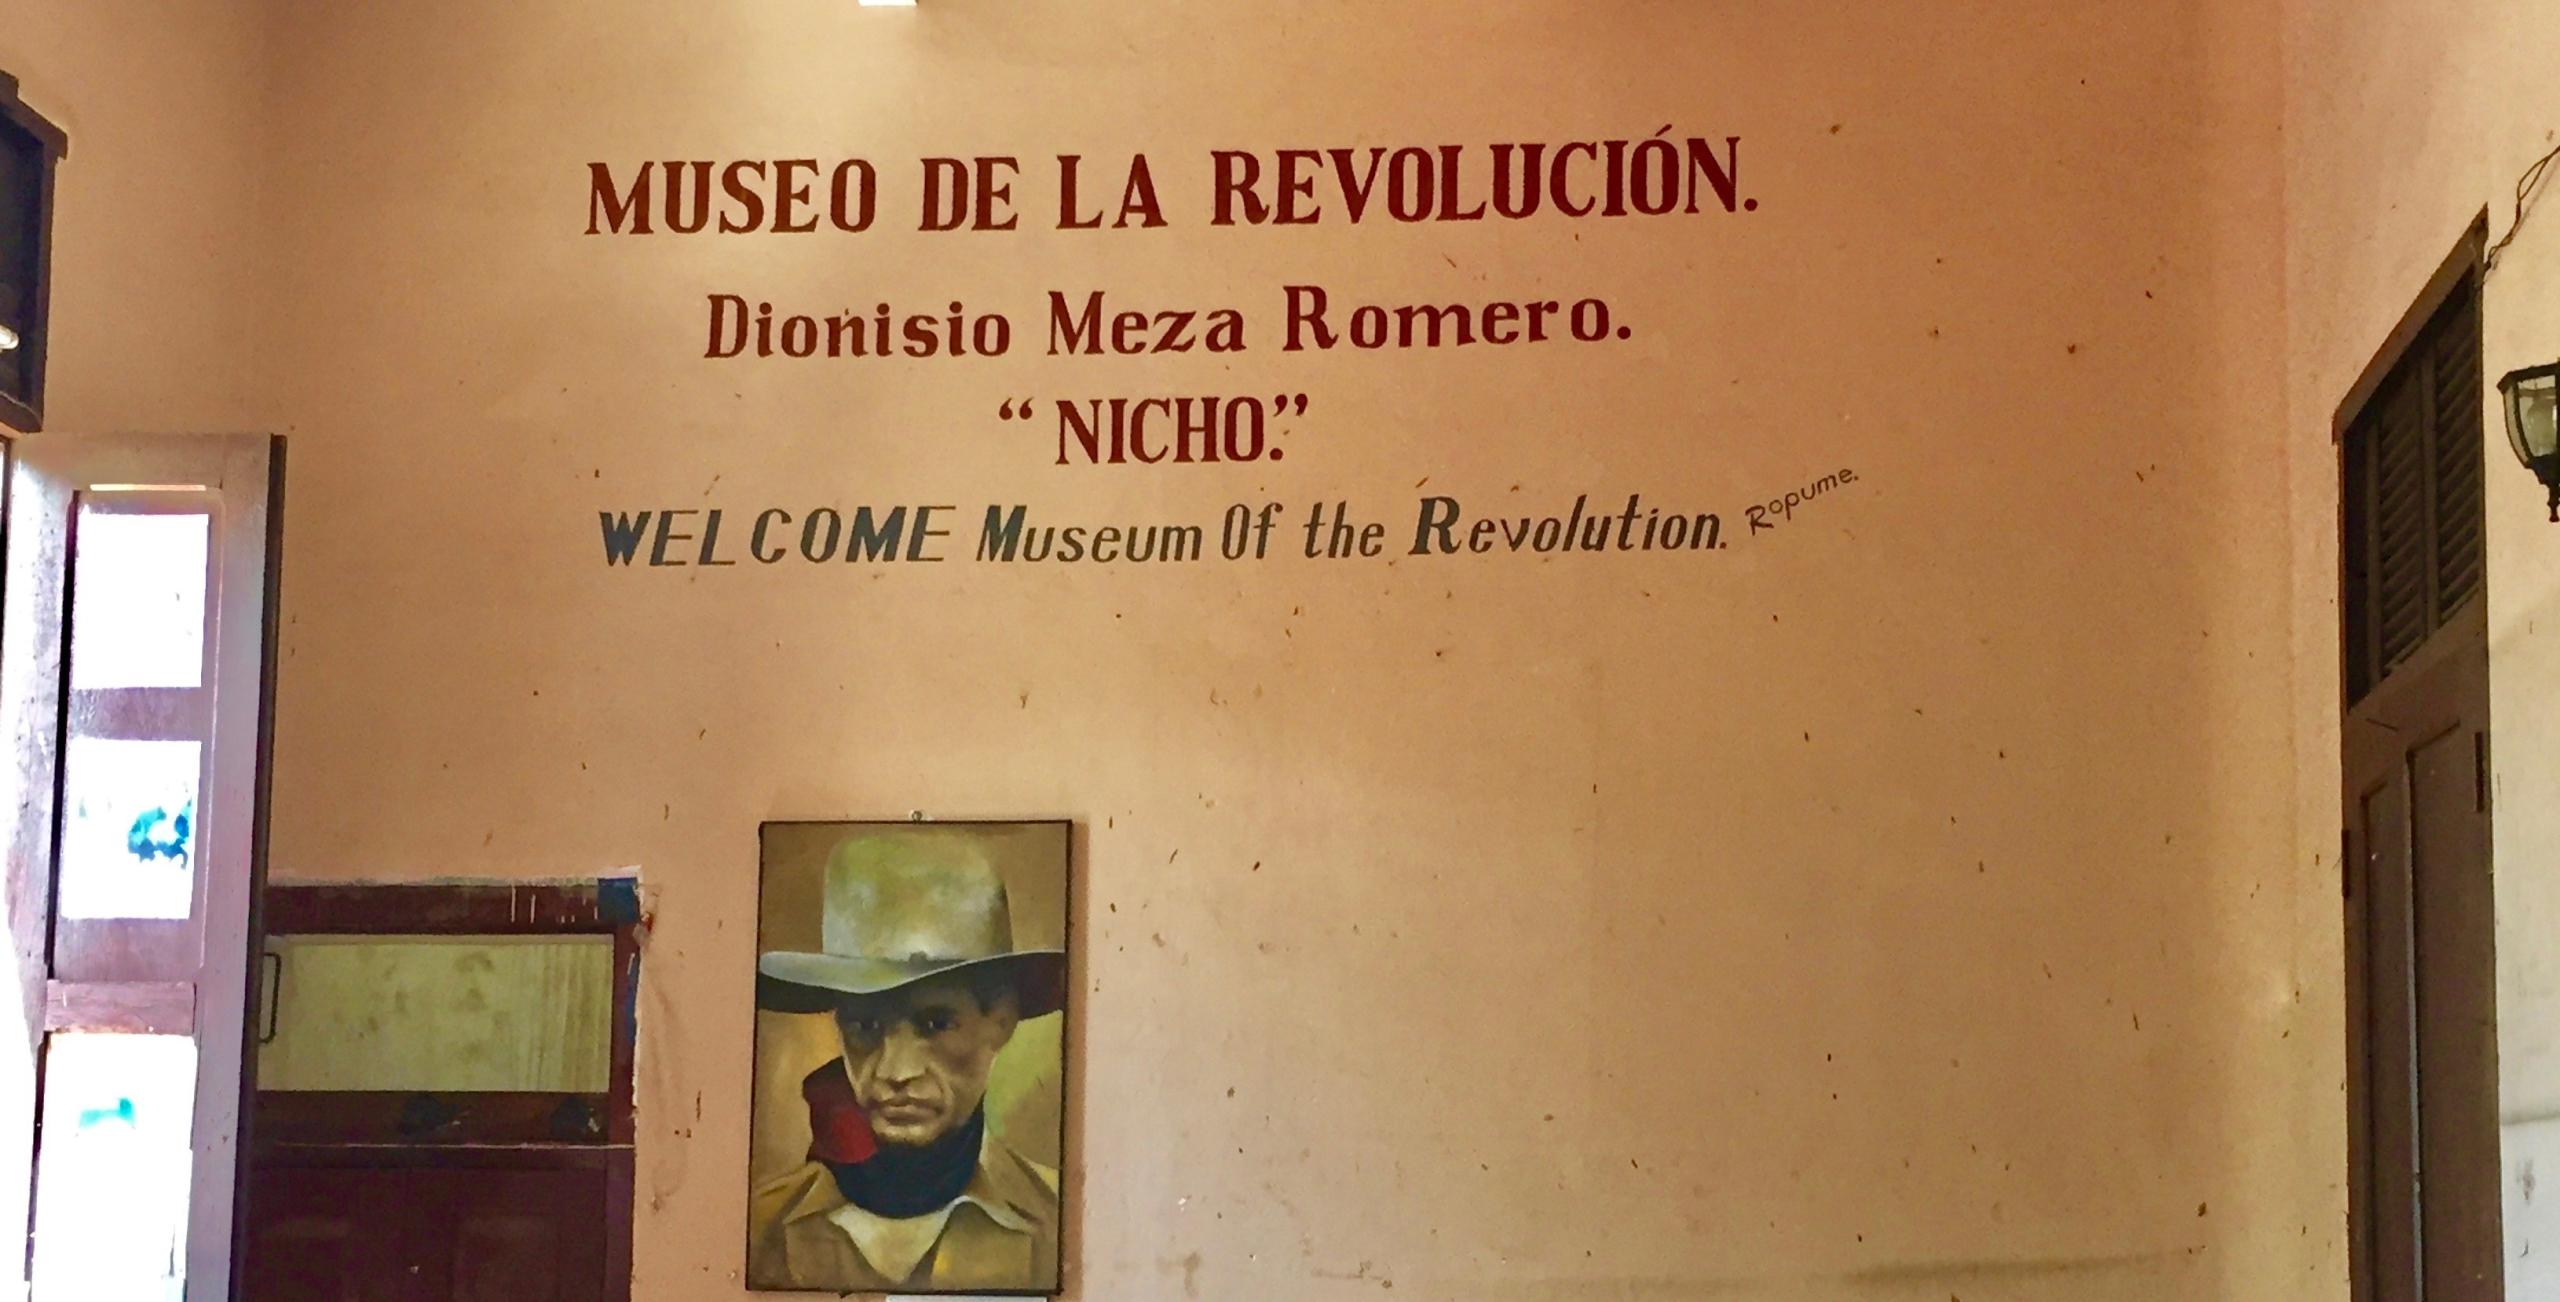 Museum of the Revolution, Leon, Nicaragua, Ortega, FSNL, Sandino, Sandinista, museum, ruin porn